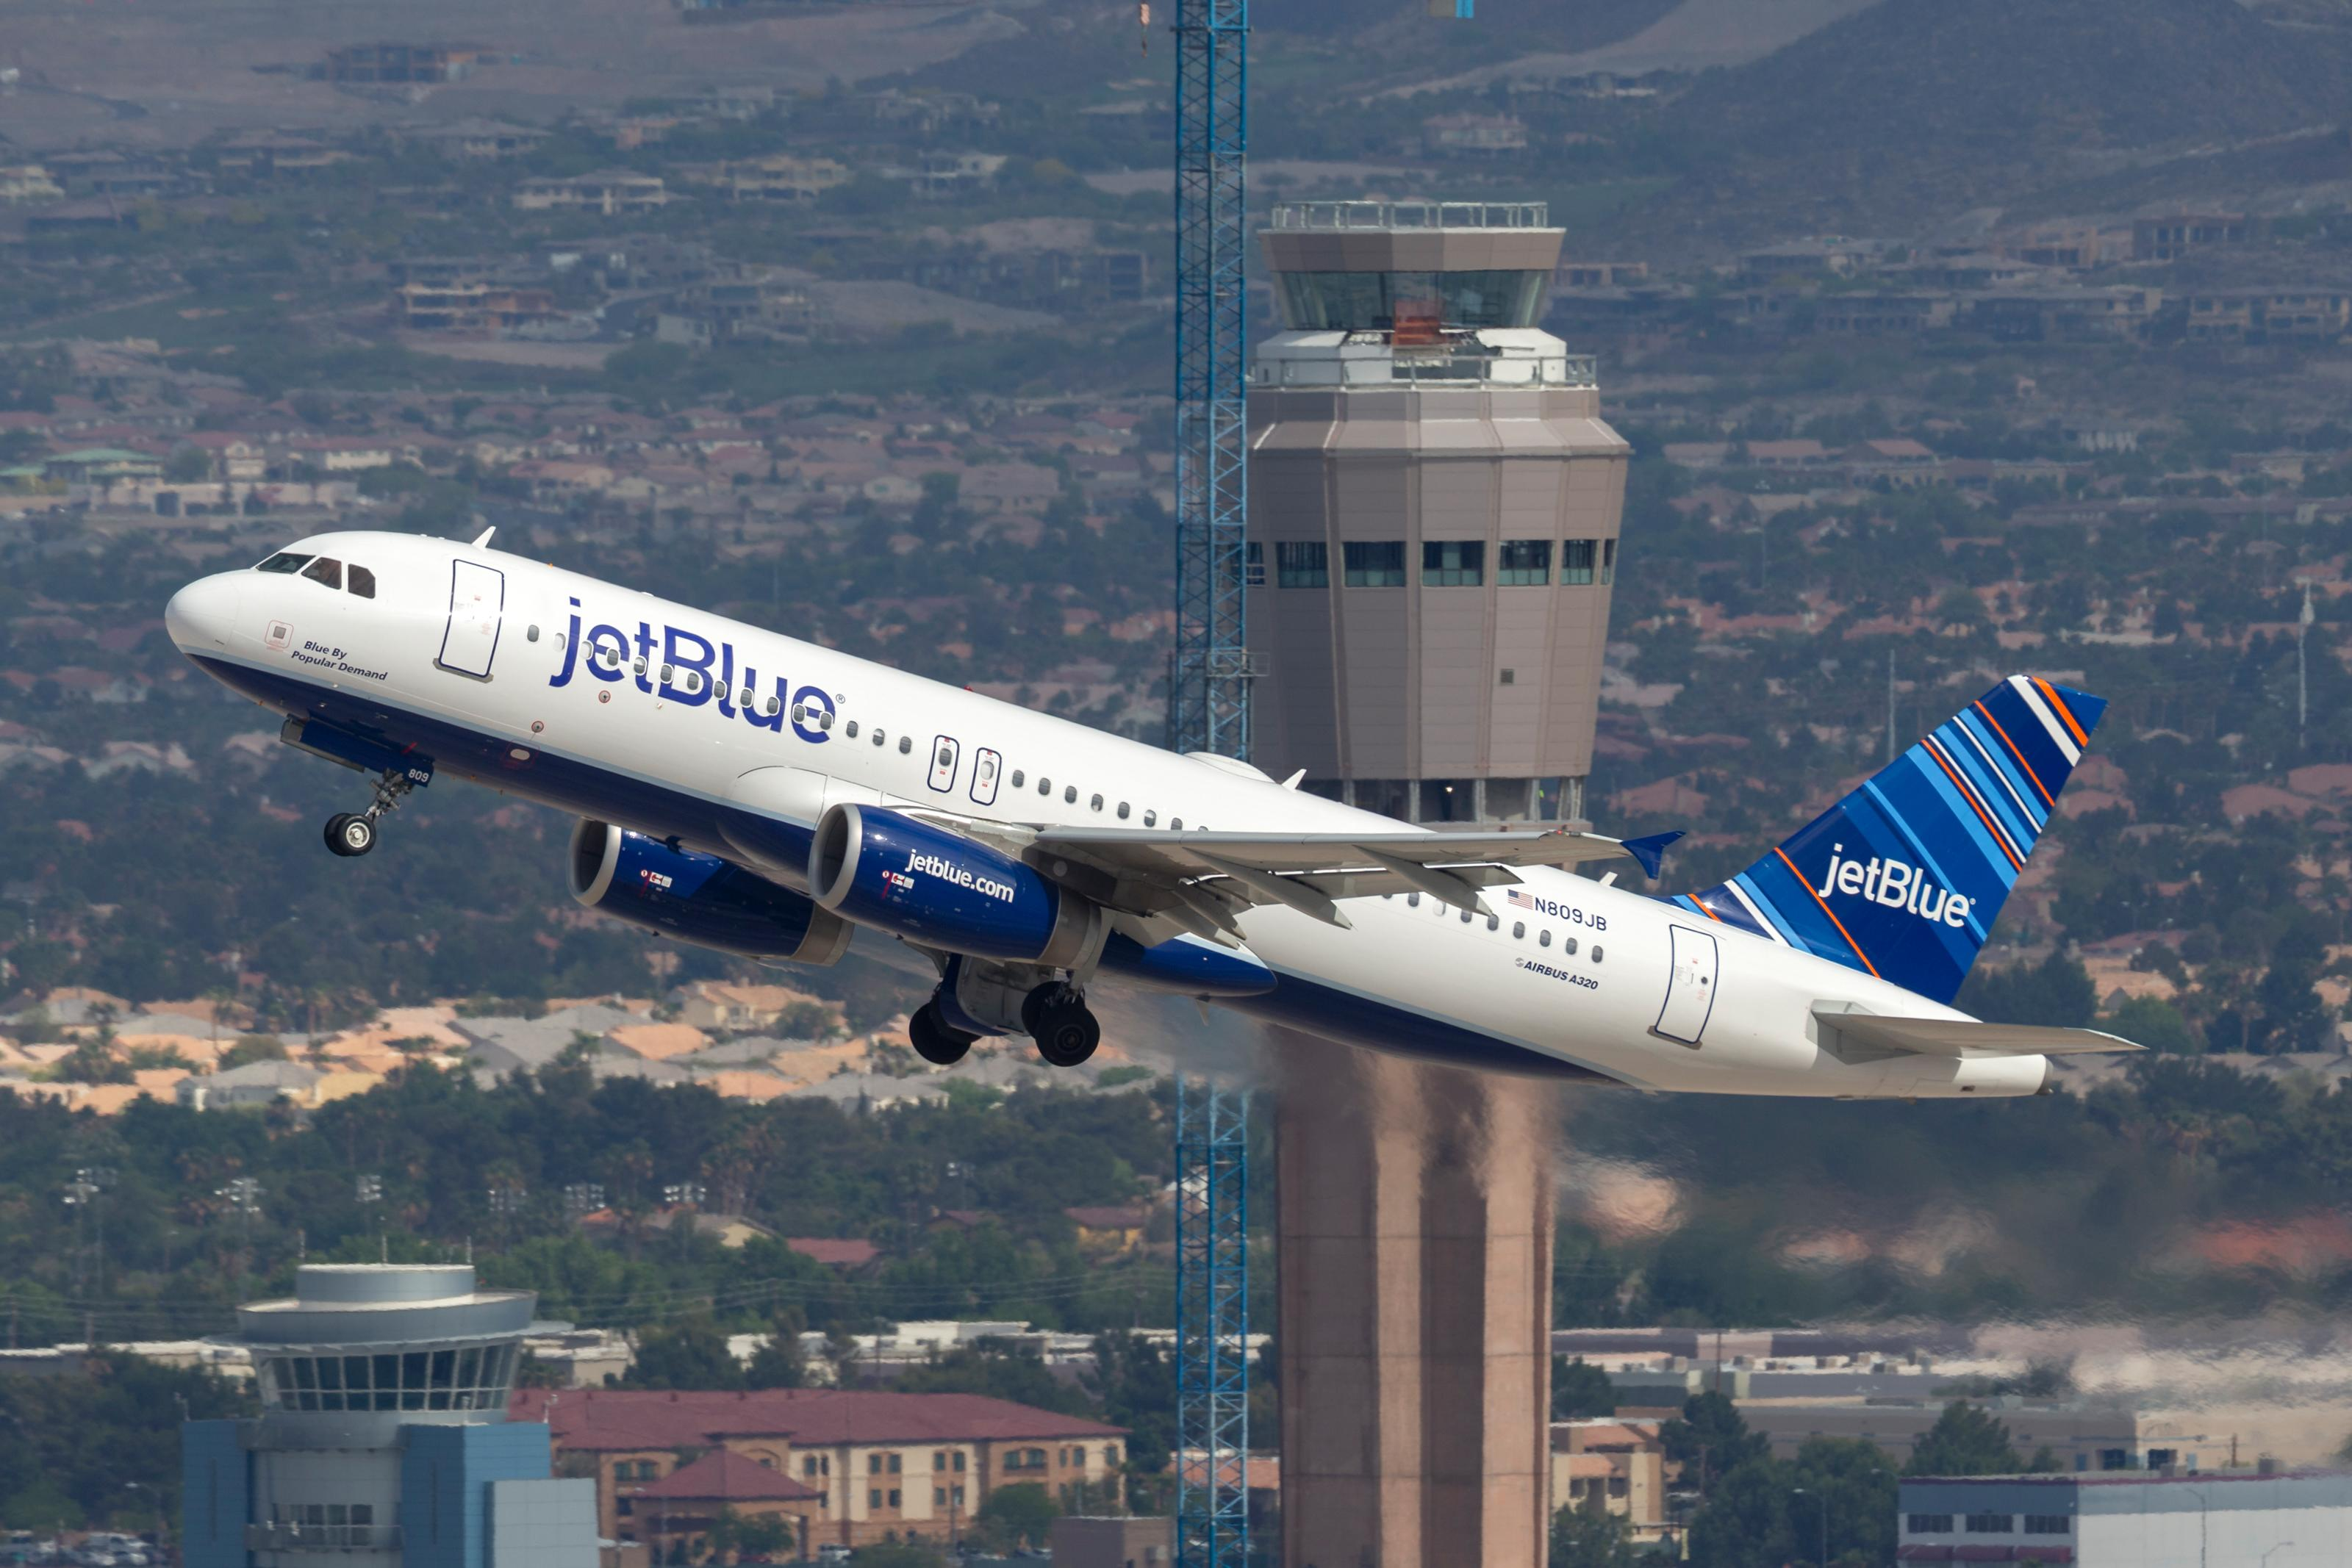 'Everybody's working on survival' as coronavirus decimates airlines